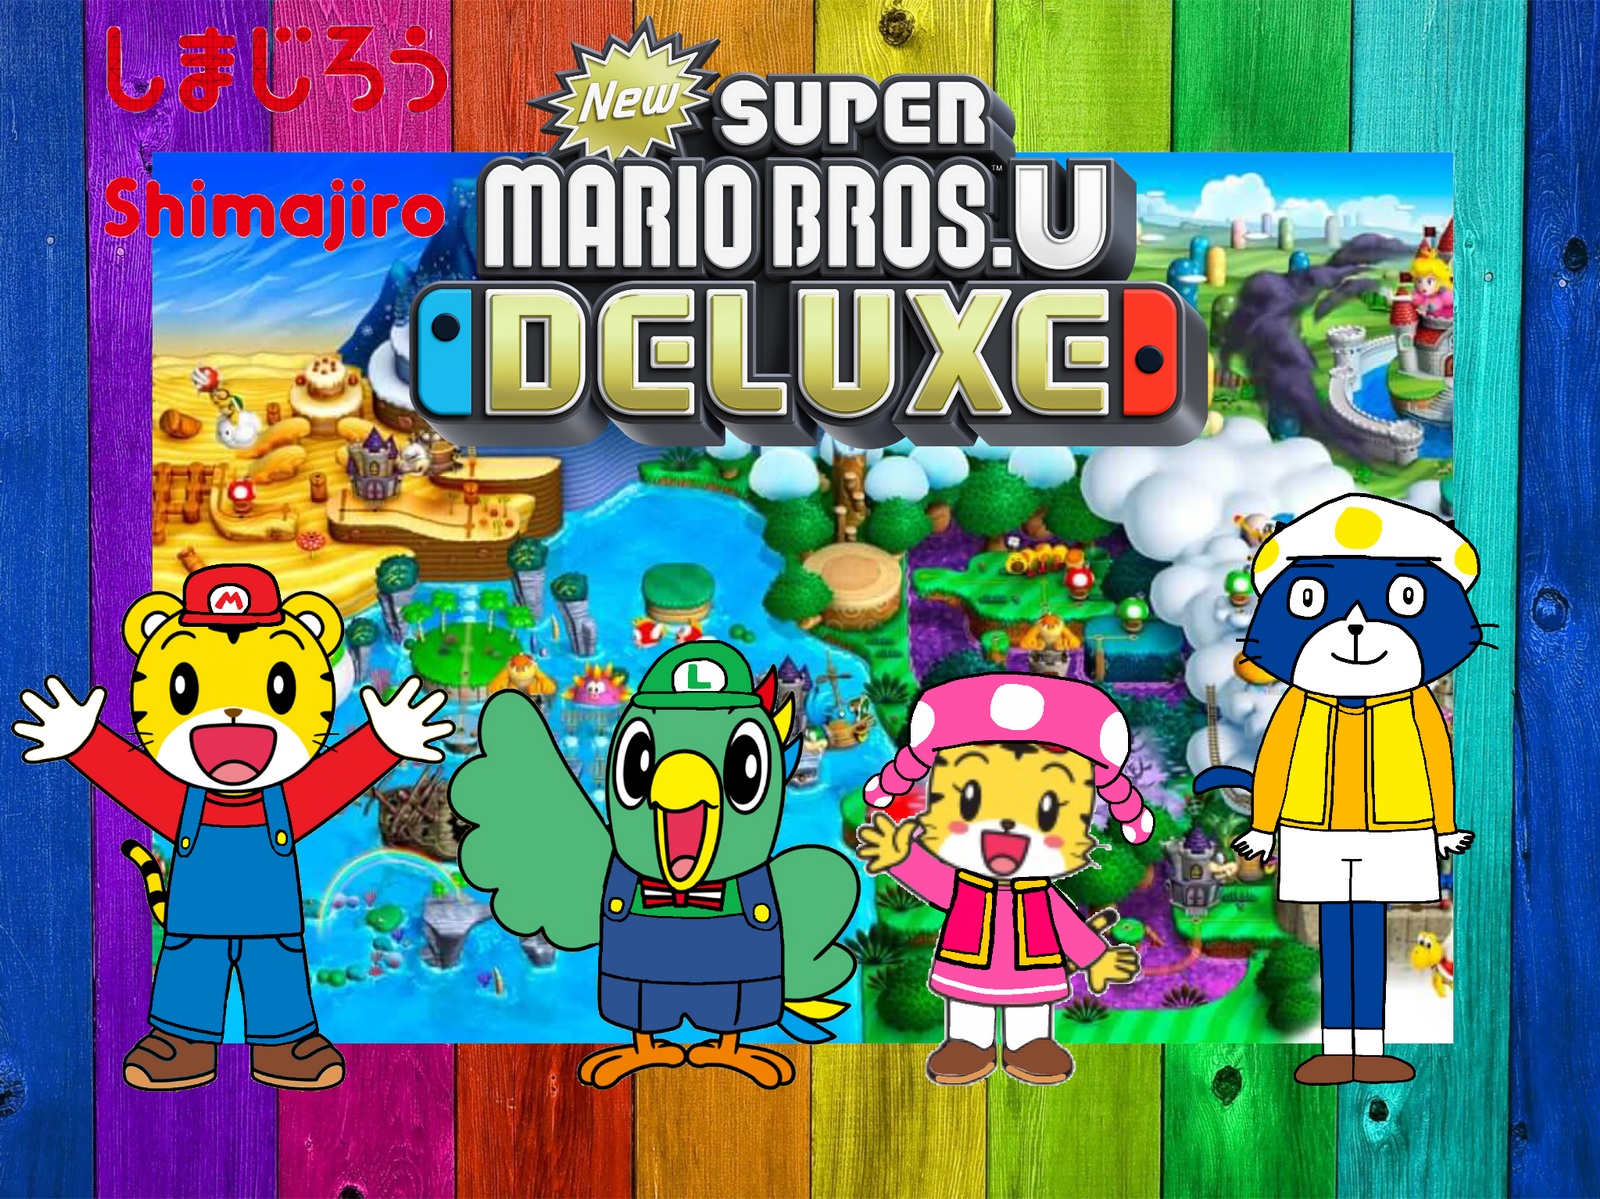 Shimajiro New Super Mario Bros U Deluxe By Joshuat1306 On Deviantart